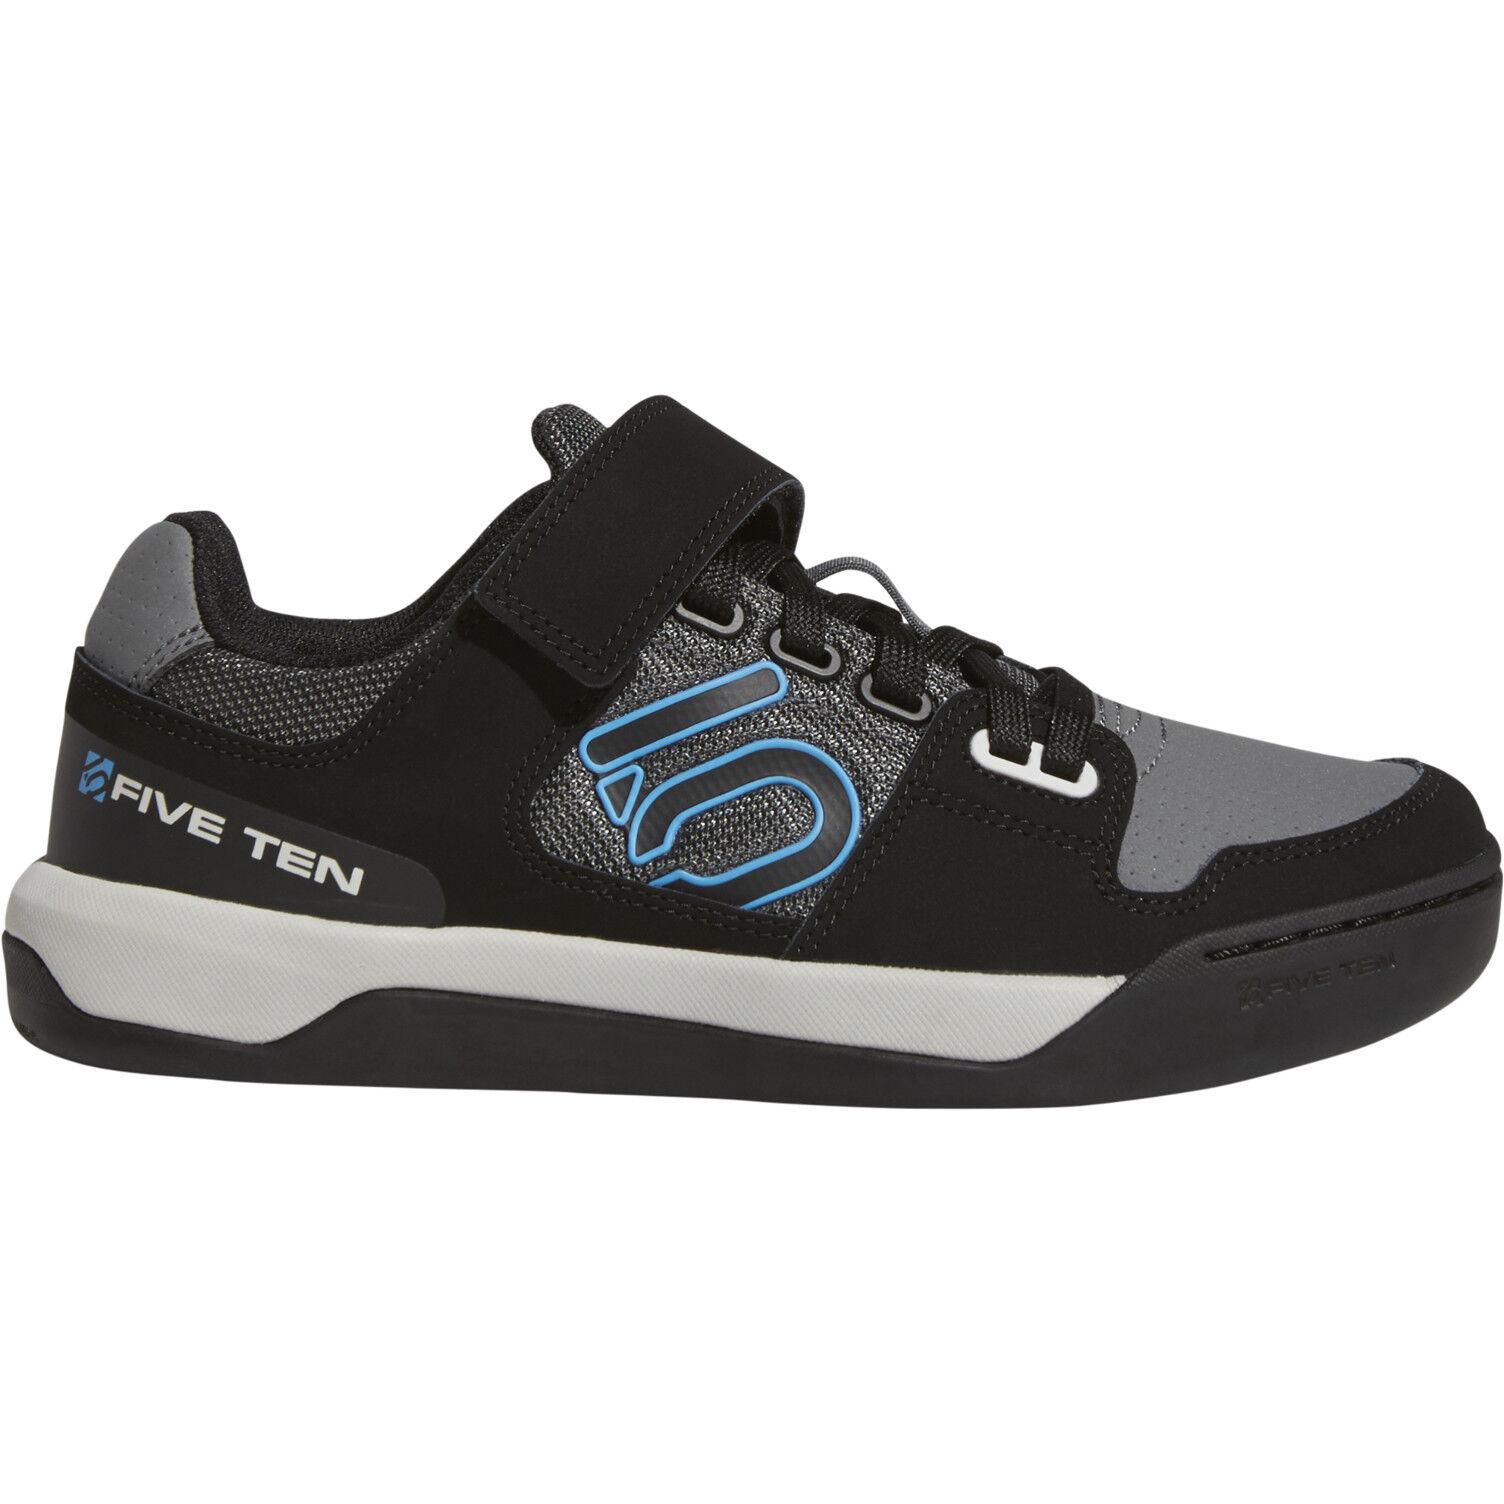 Ten Kaufen Mtb Five Klickschuhe Adidas Günstig CBdxoe